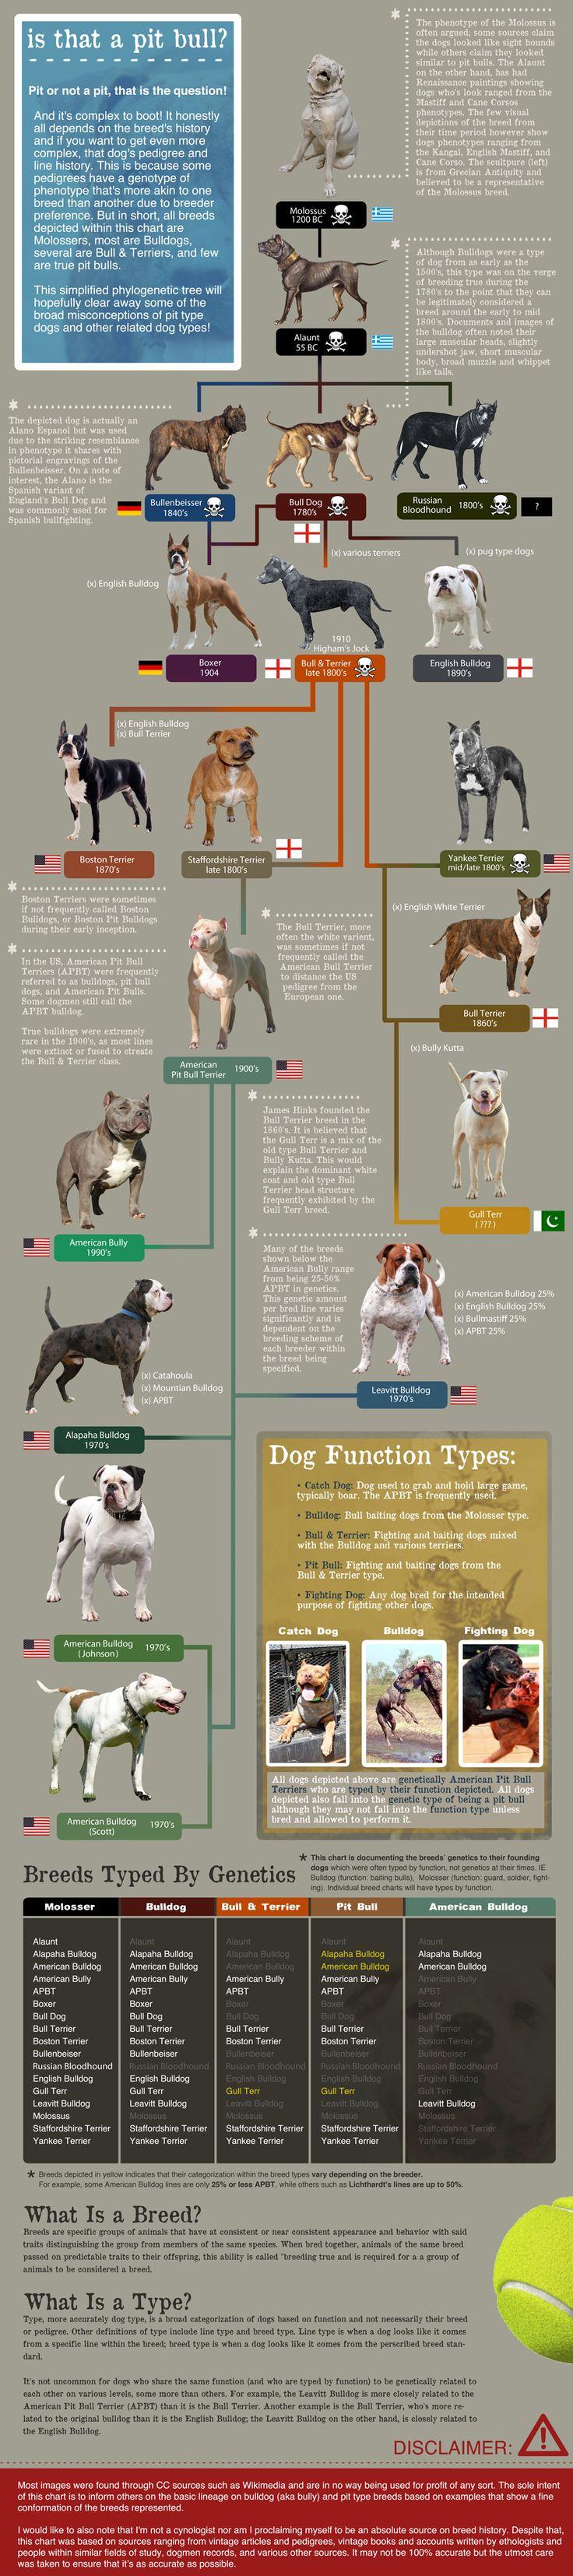 Ukc Dog Breed Standards